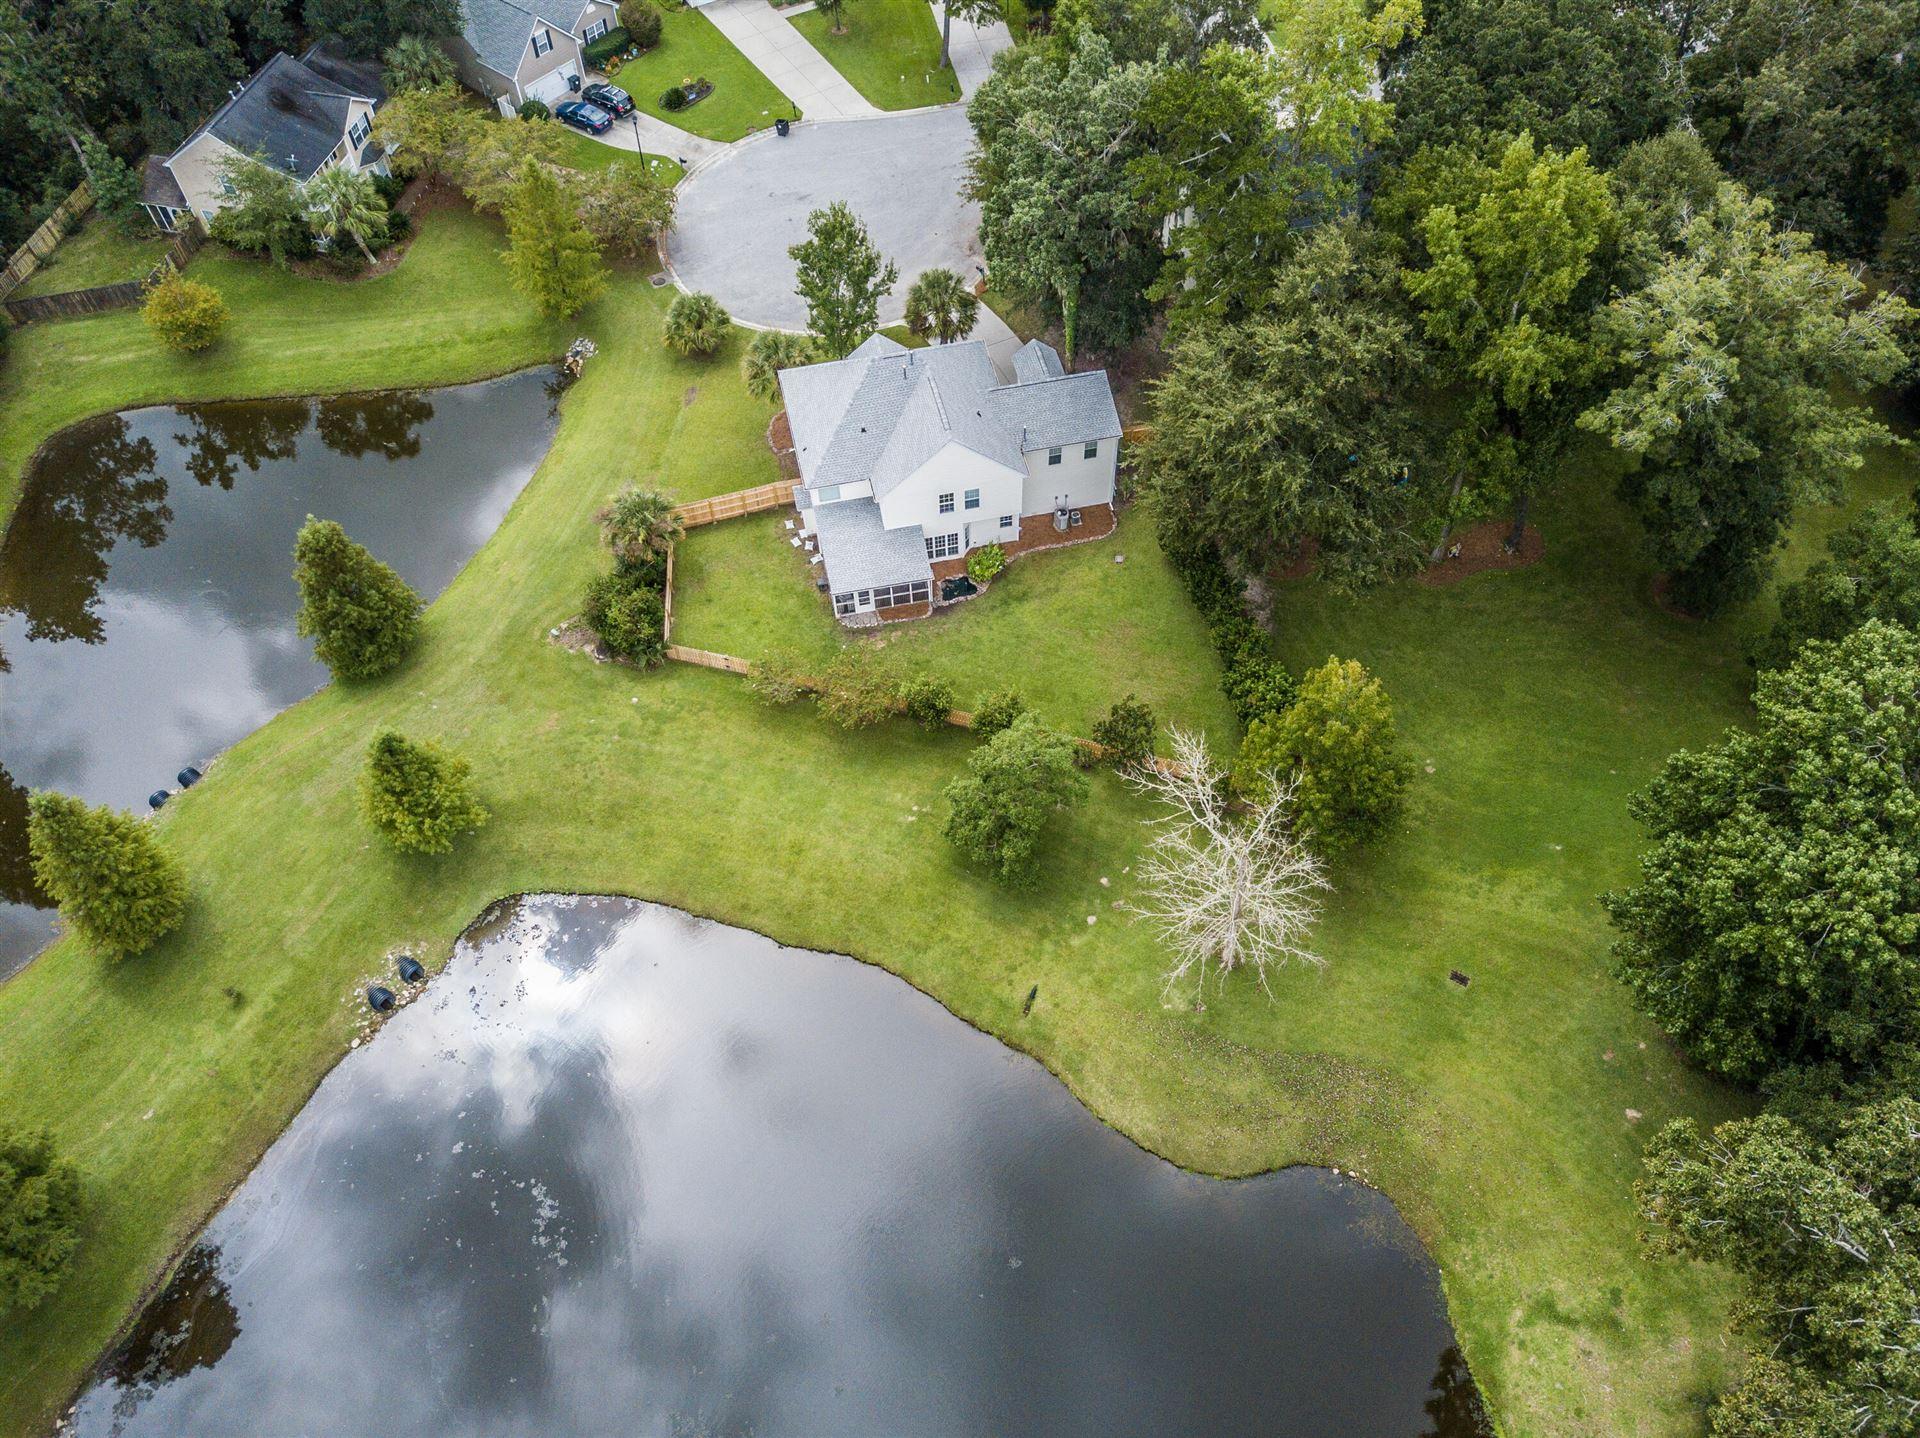 Photo of 5423 Rock Creek Court, North Charleston, SC 29420 (MLS # 21025551)